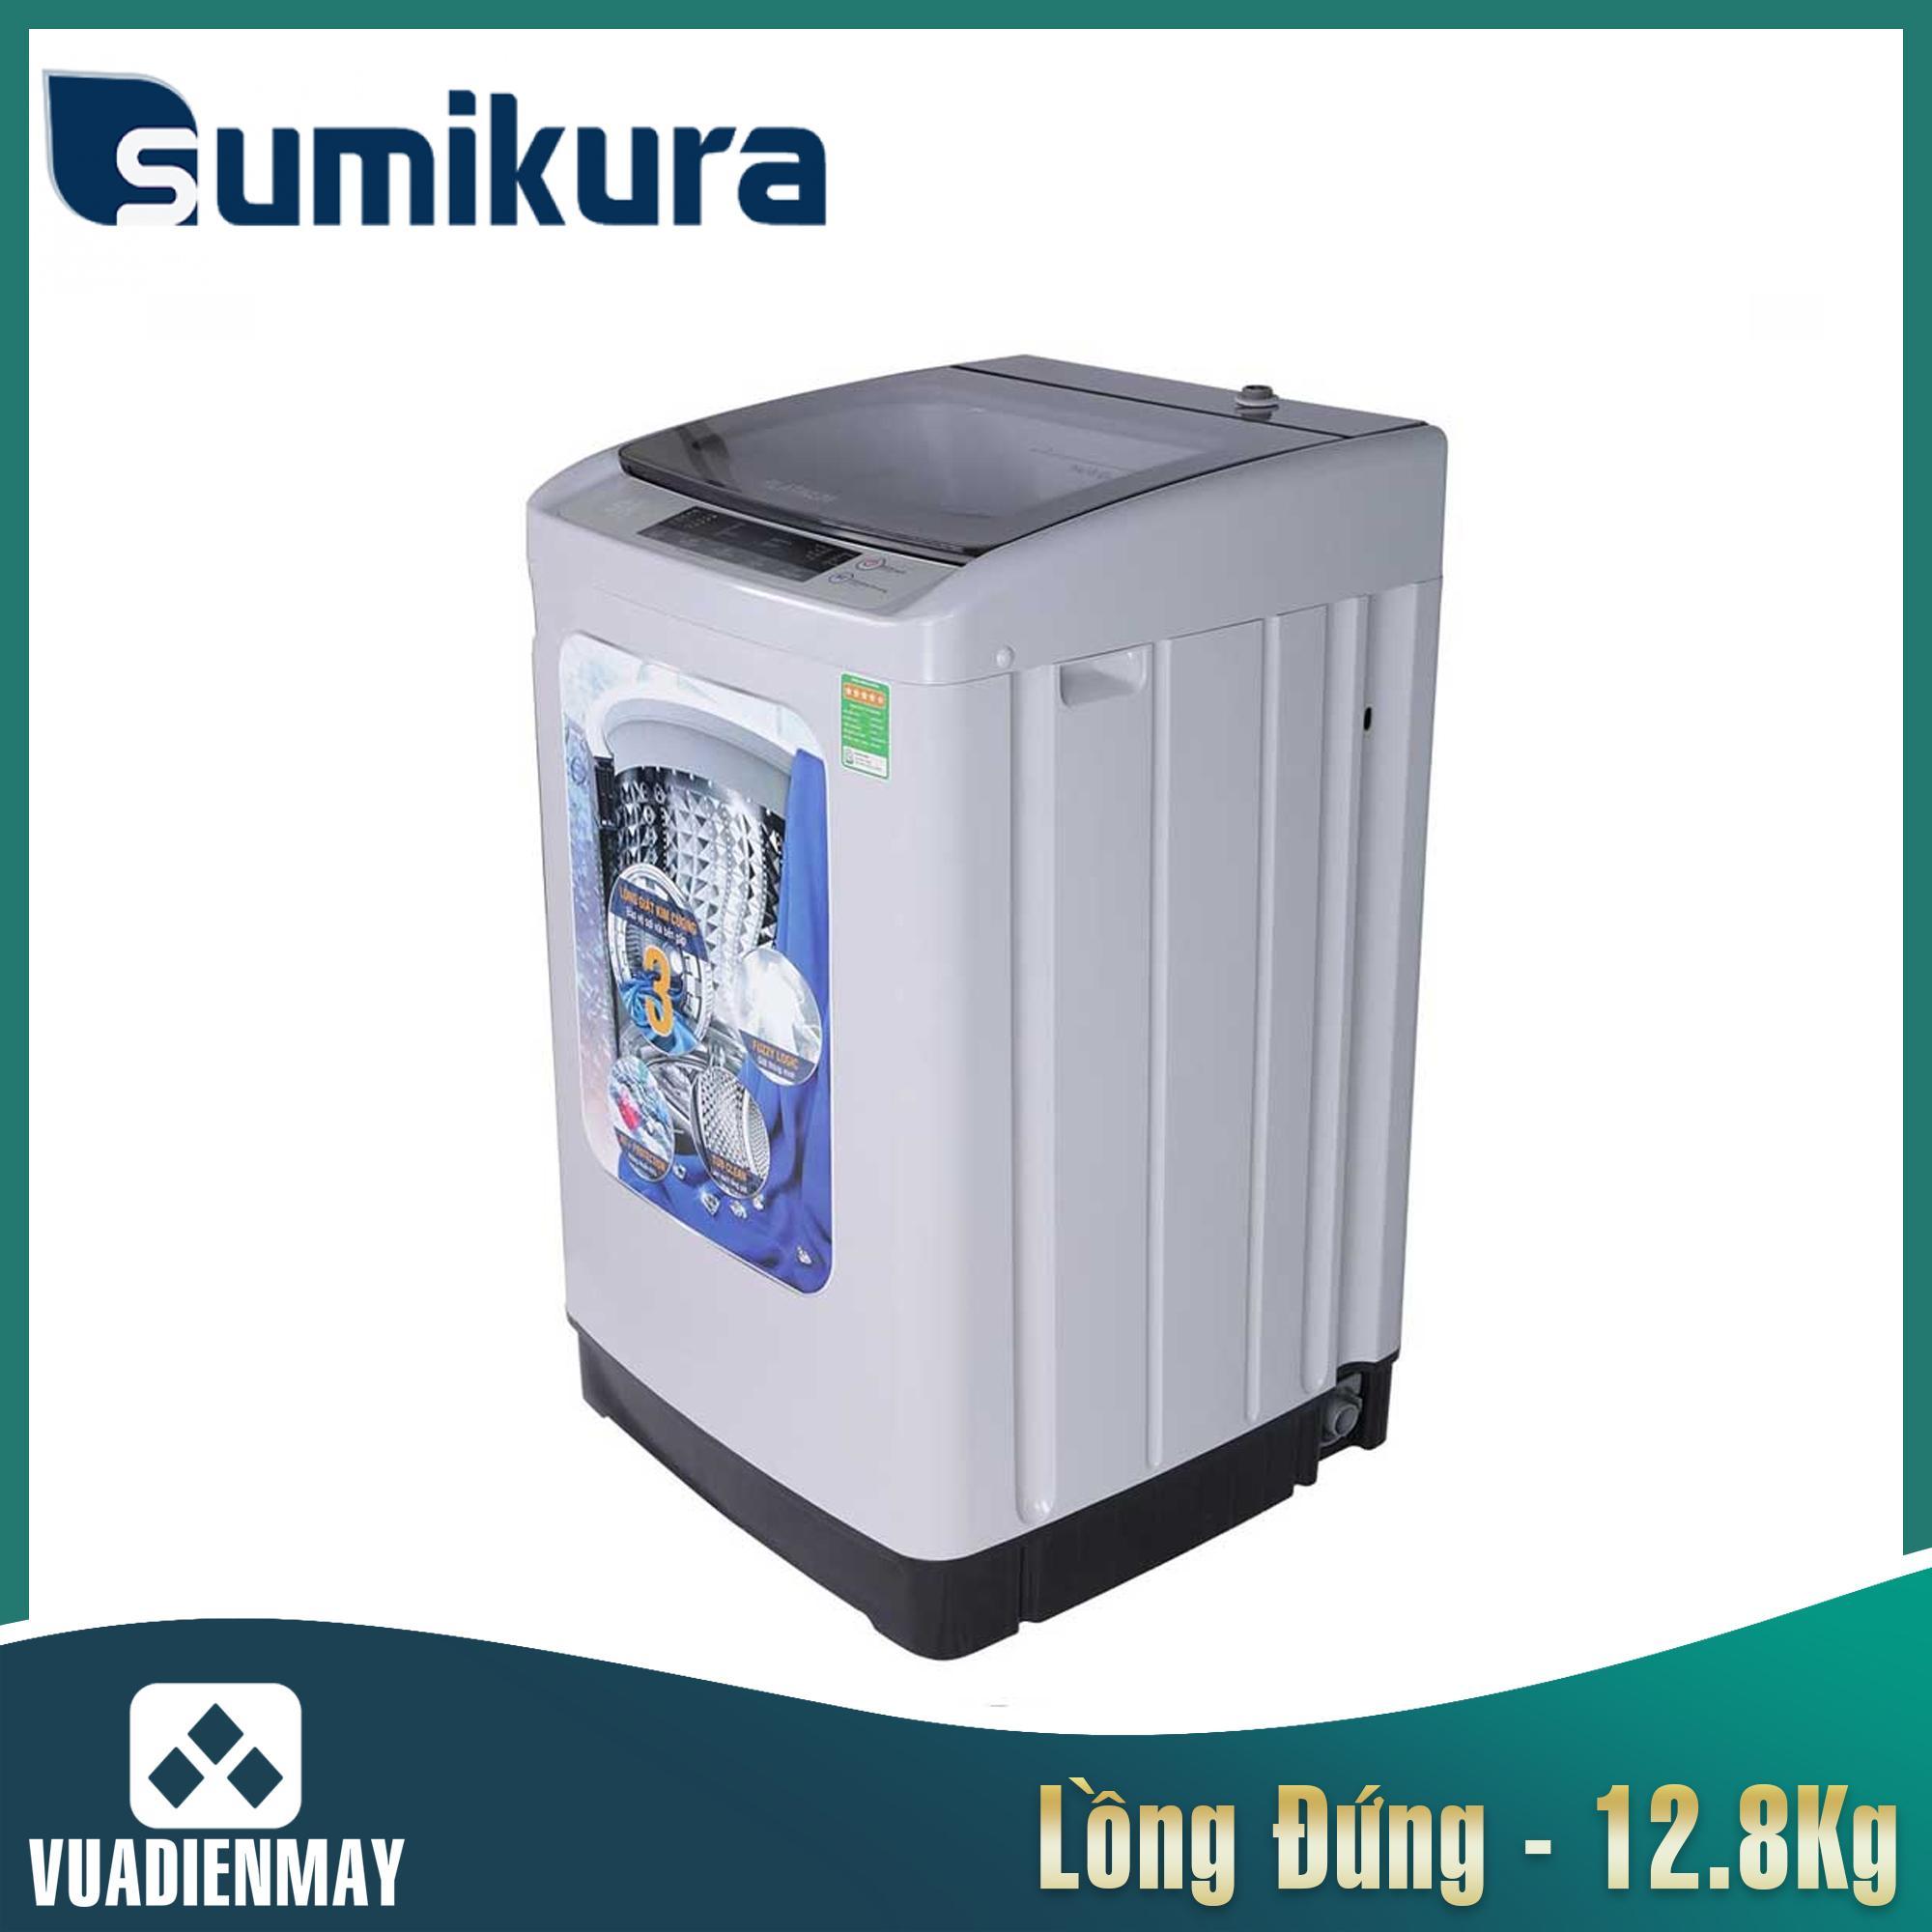 Máy giặt Sumikura  12.8kg lồng đứng